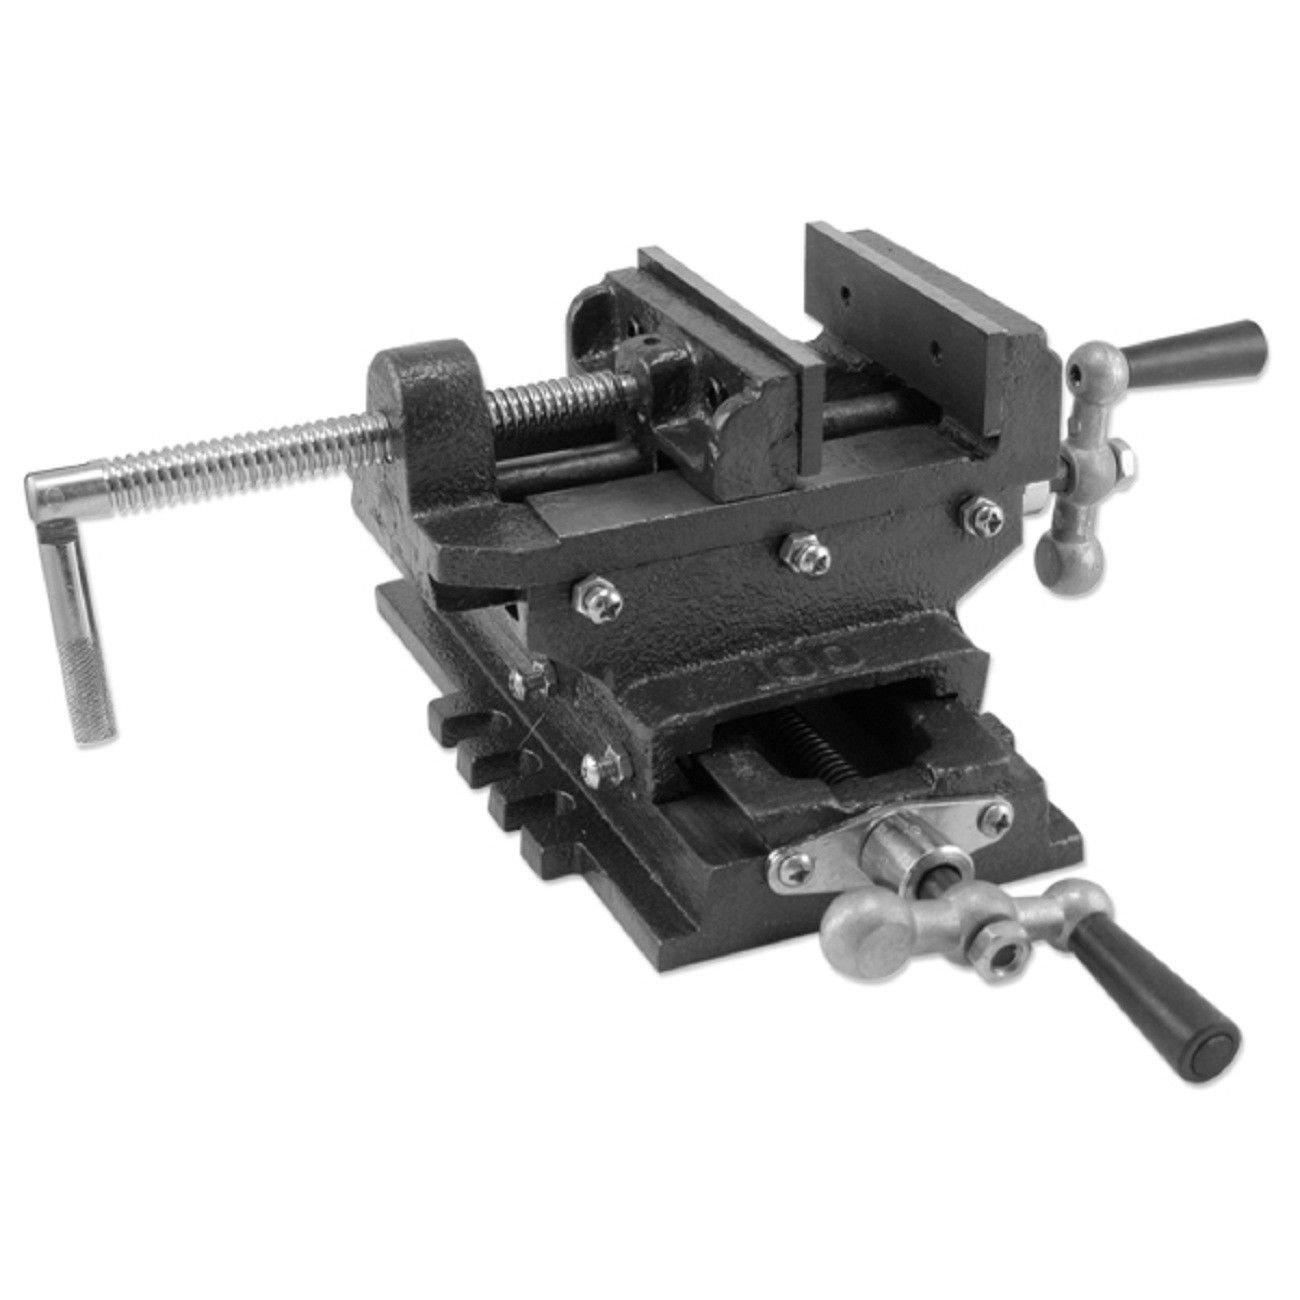 Moon Daughter Heavy Duty Drill Vise Press 4'' Cross Slide Metal Milling 2 Way X-Y Clamp Machine